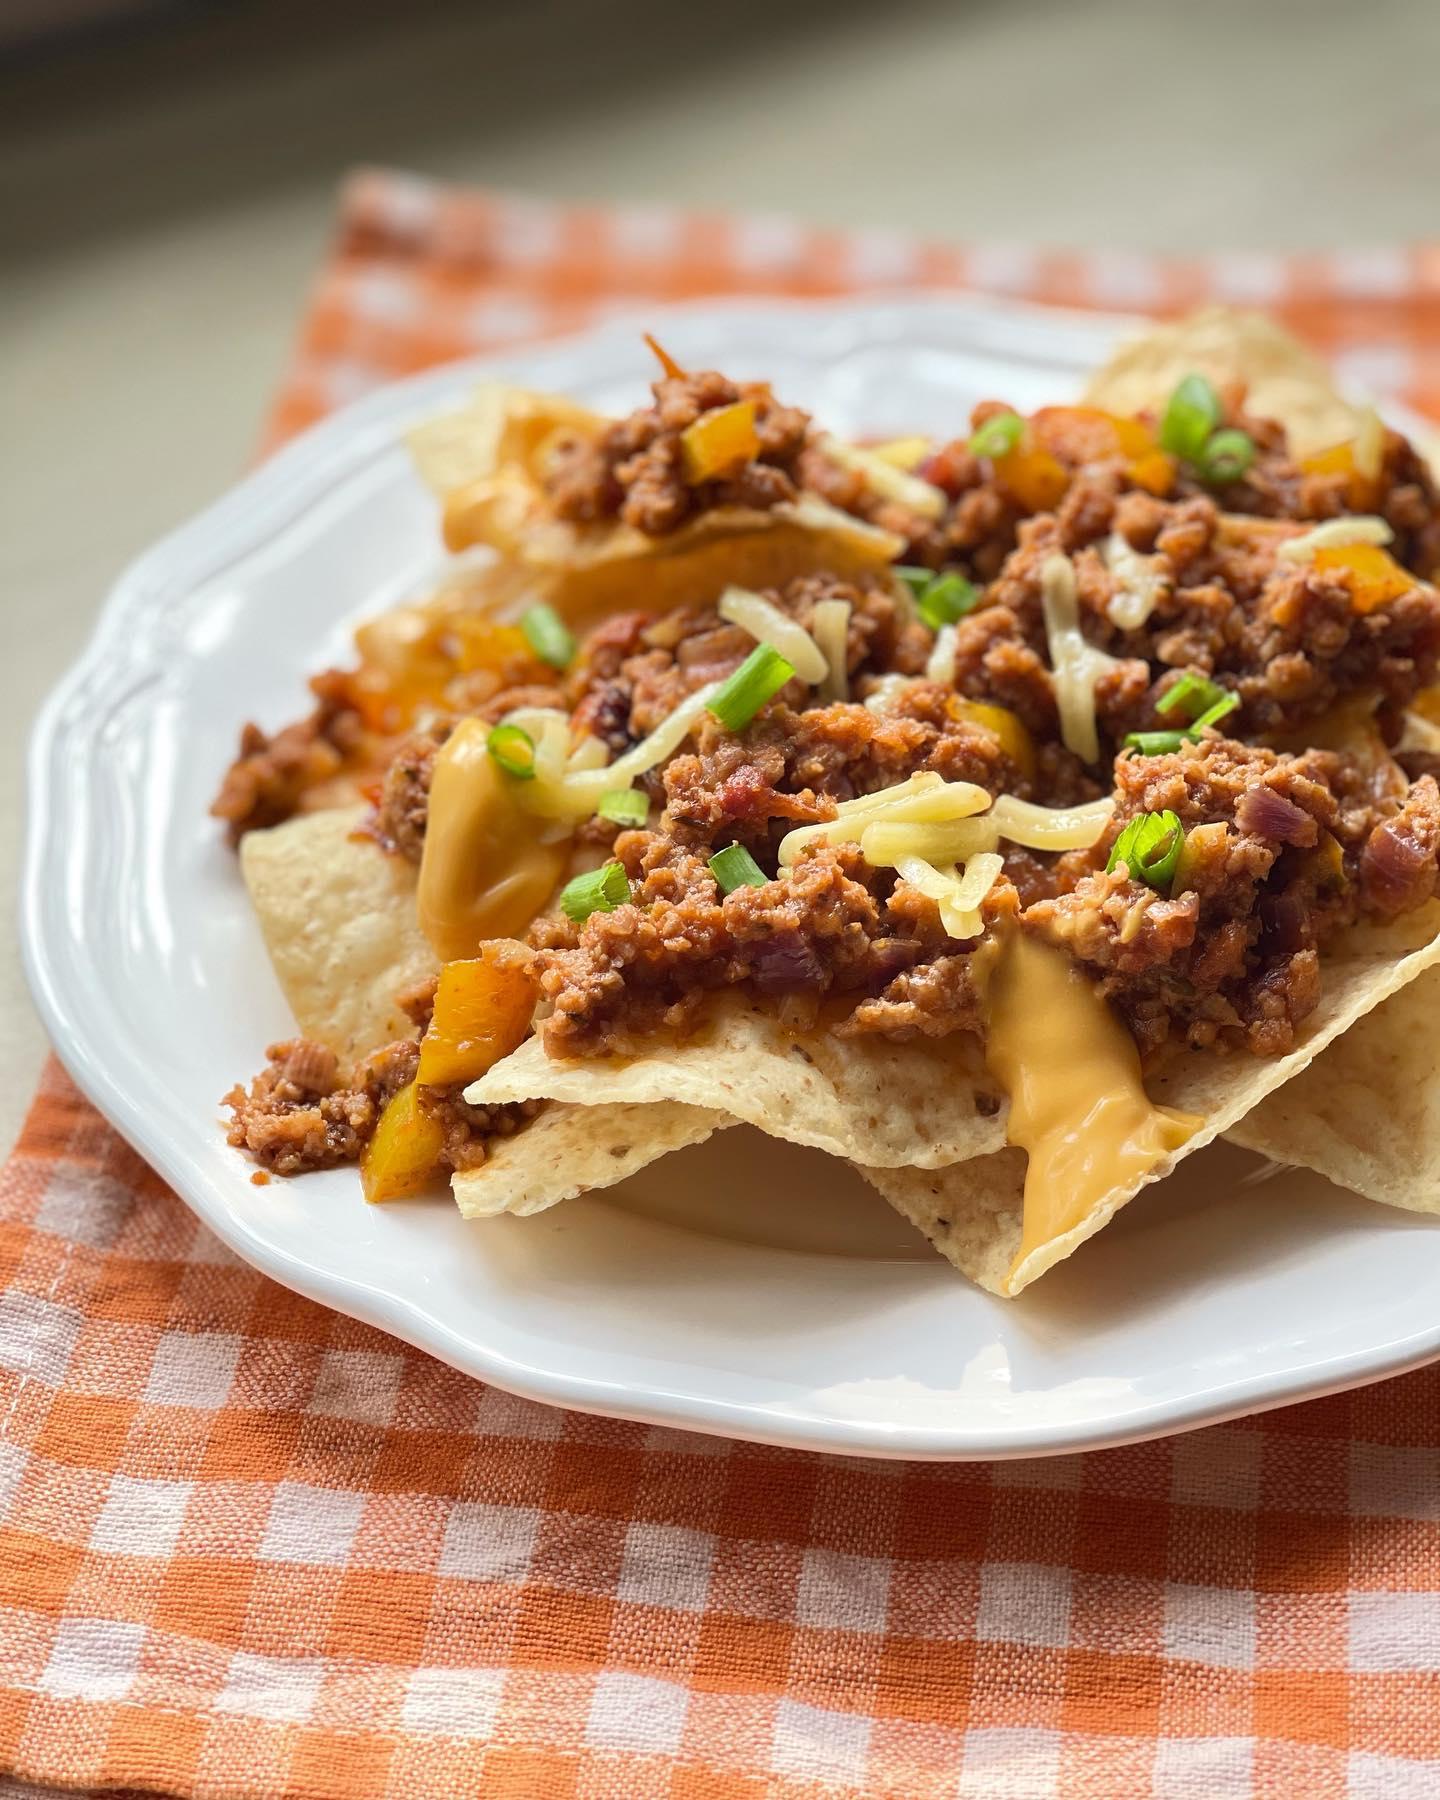 Mexican Food - Beef Nachos - House of Hazelknots